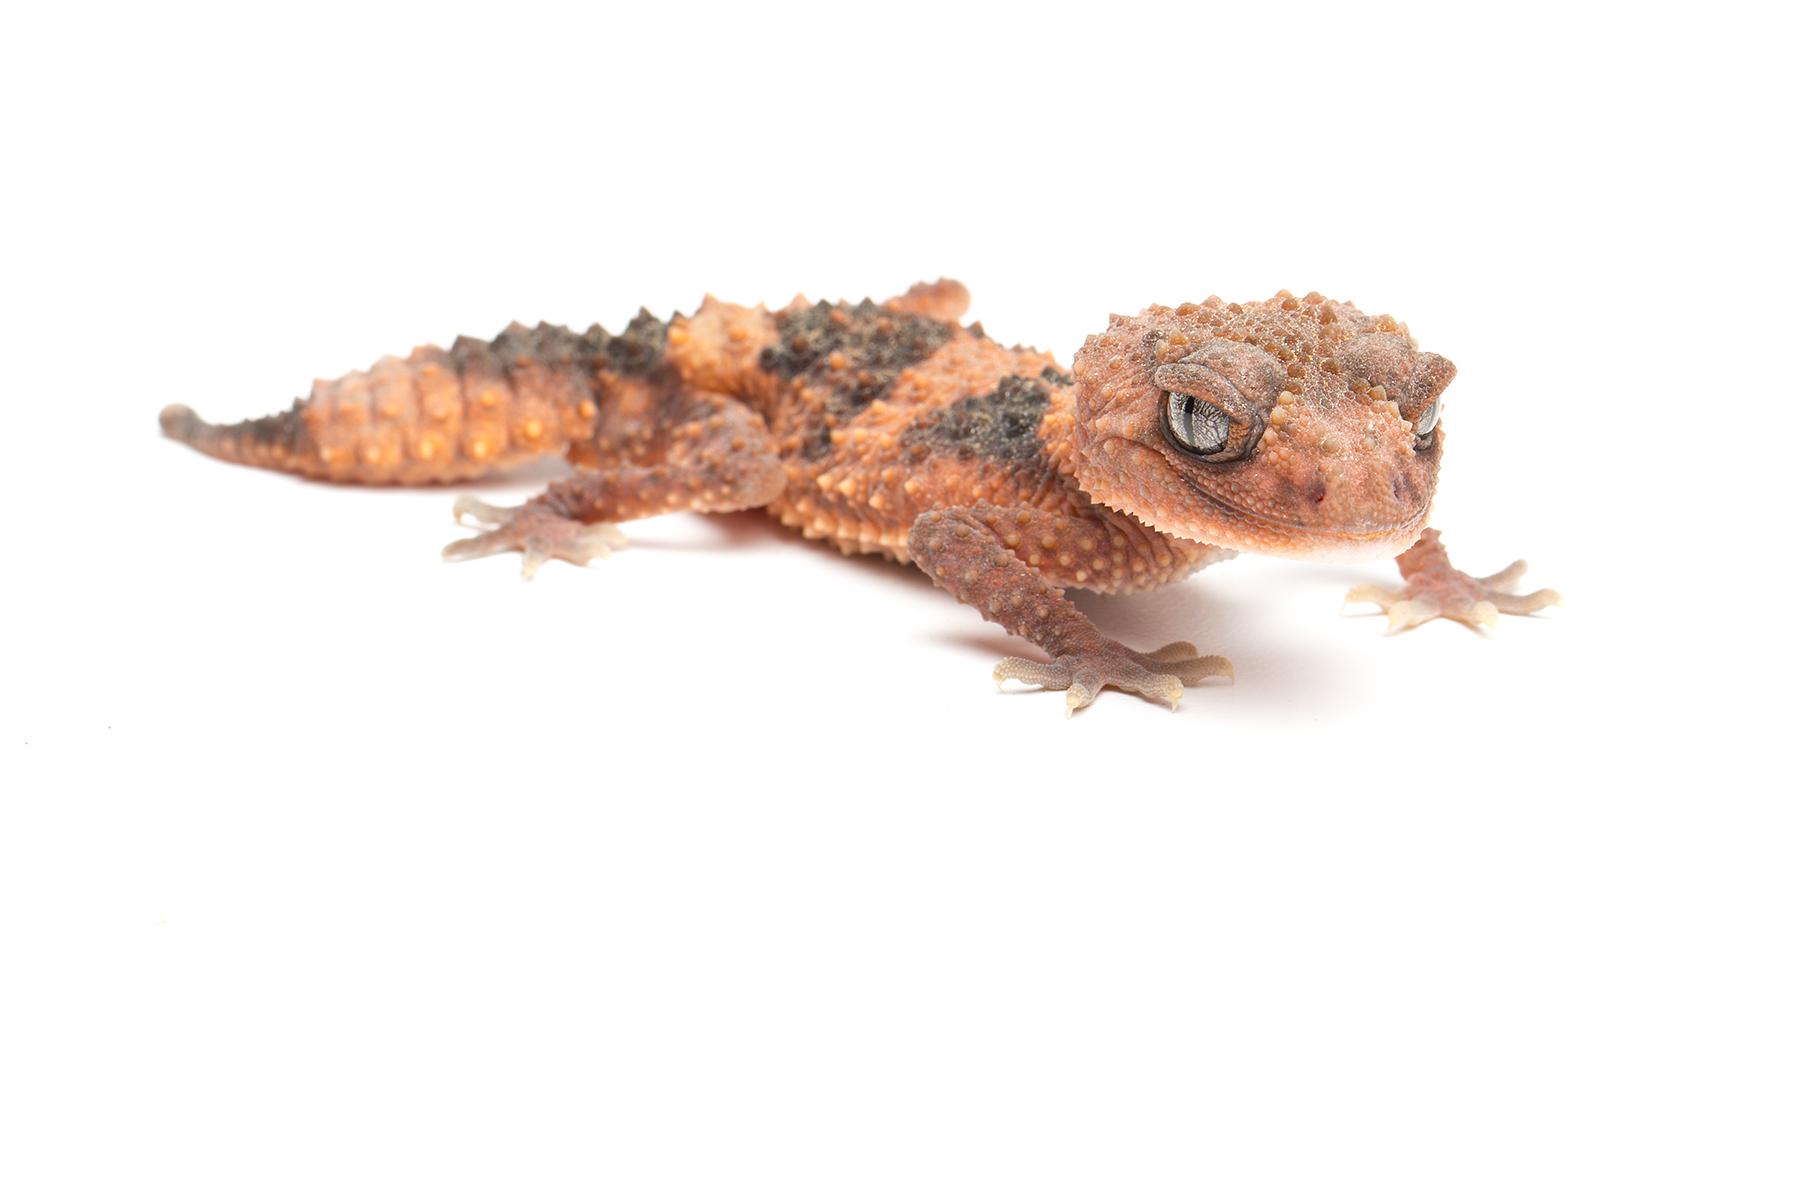 Adult male Nephrurus wheeleri cinctus